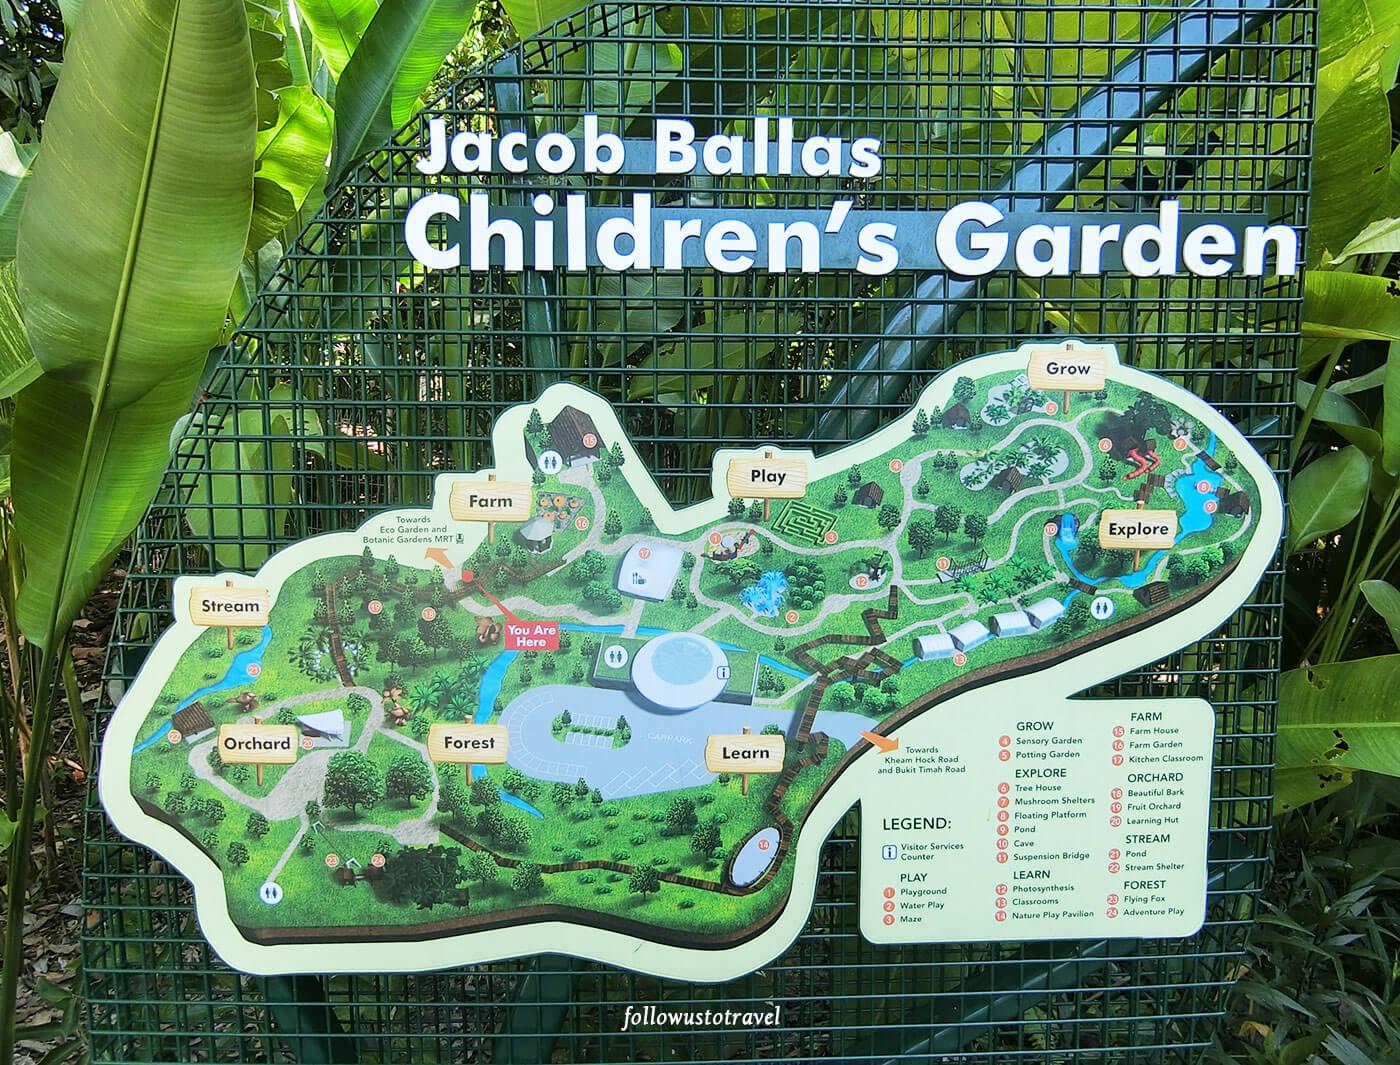 Jacob Ballas Childrens Garden Map